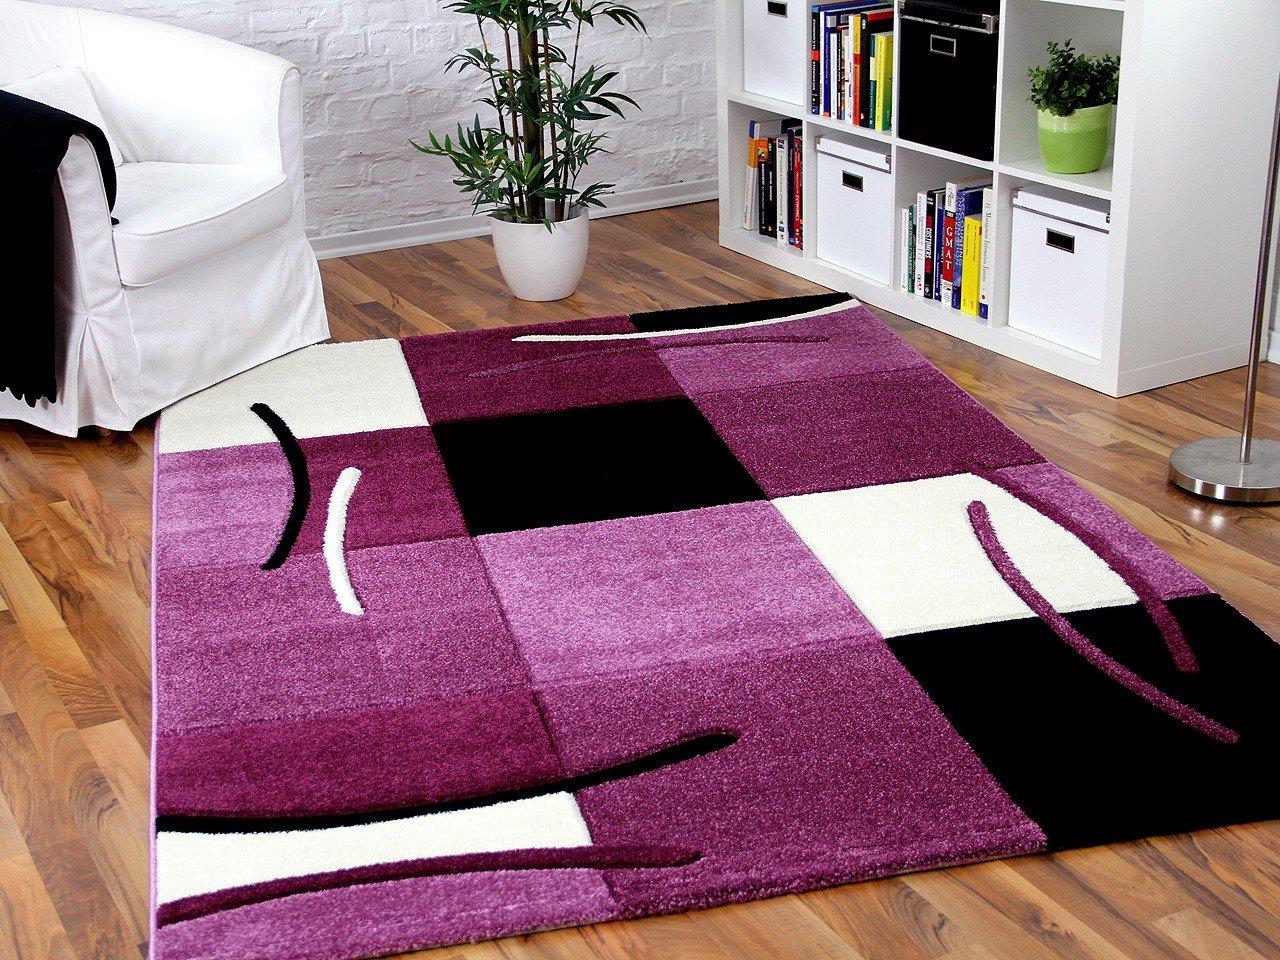 Teppich lila  Designer Teppich Maui Lila Schwarz Grau Karo in 5 Größen ...